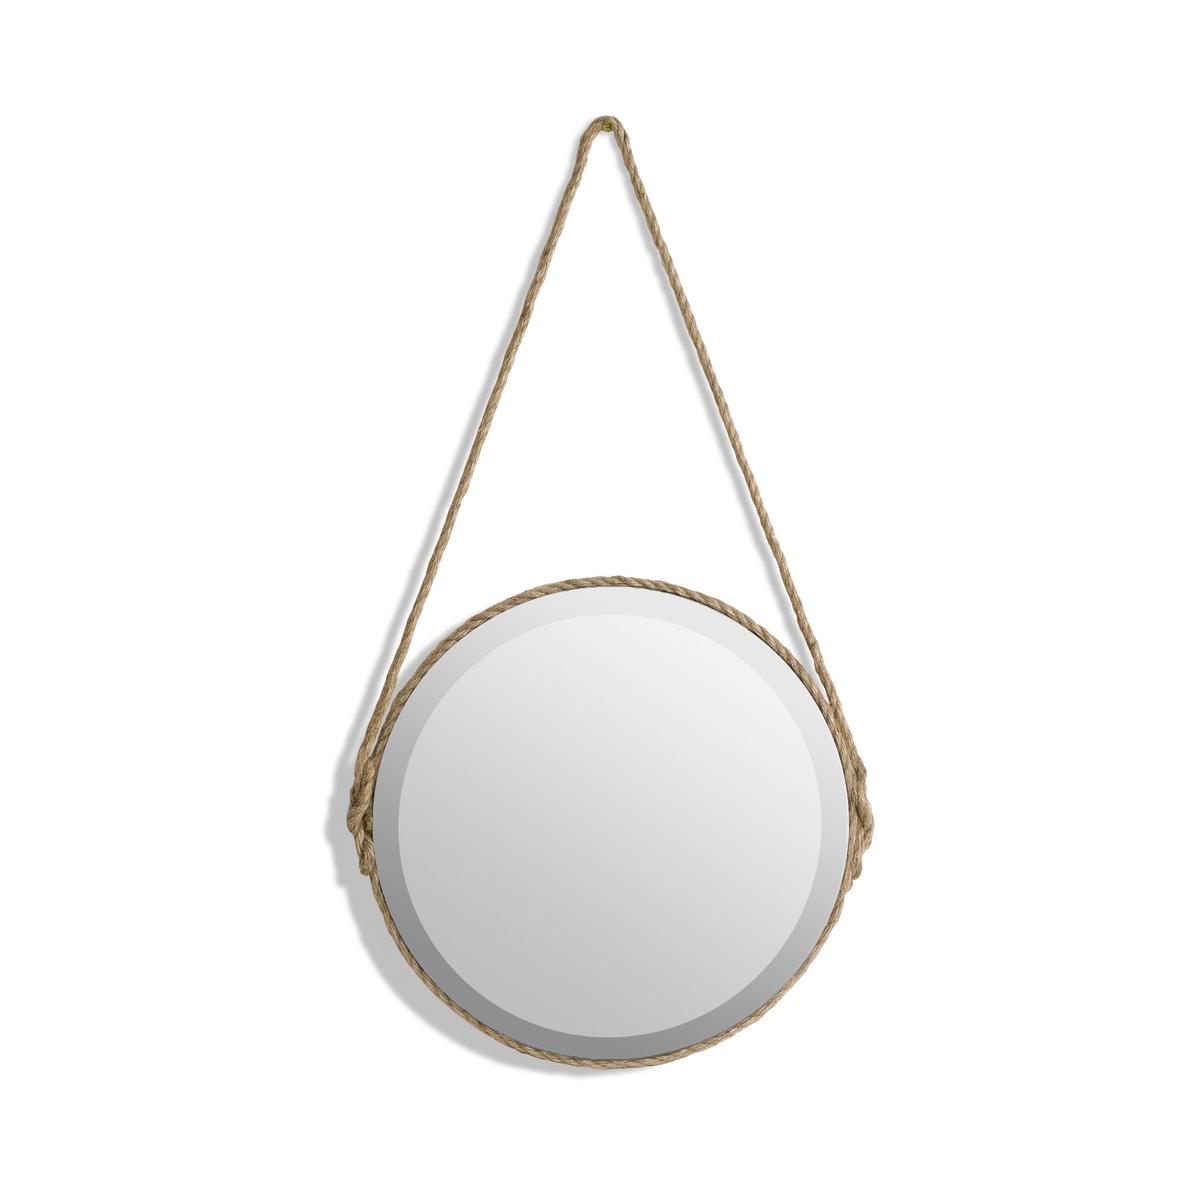 Зеркало Lien, диаметр 35 см подушка lien a вега массажная